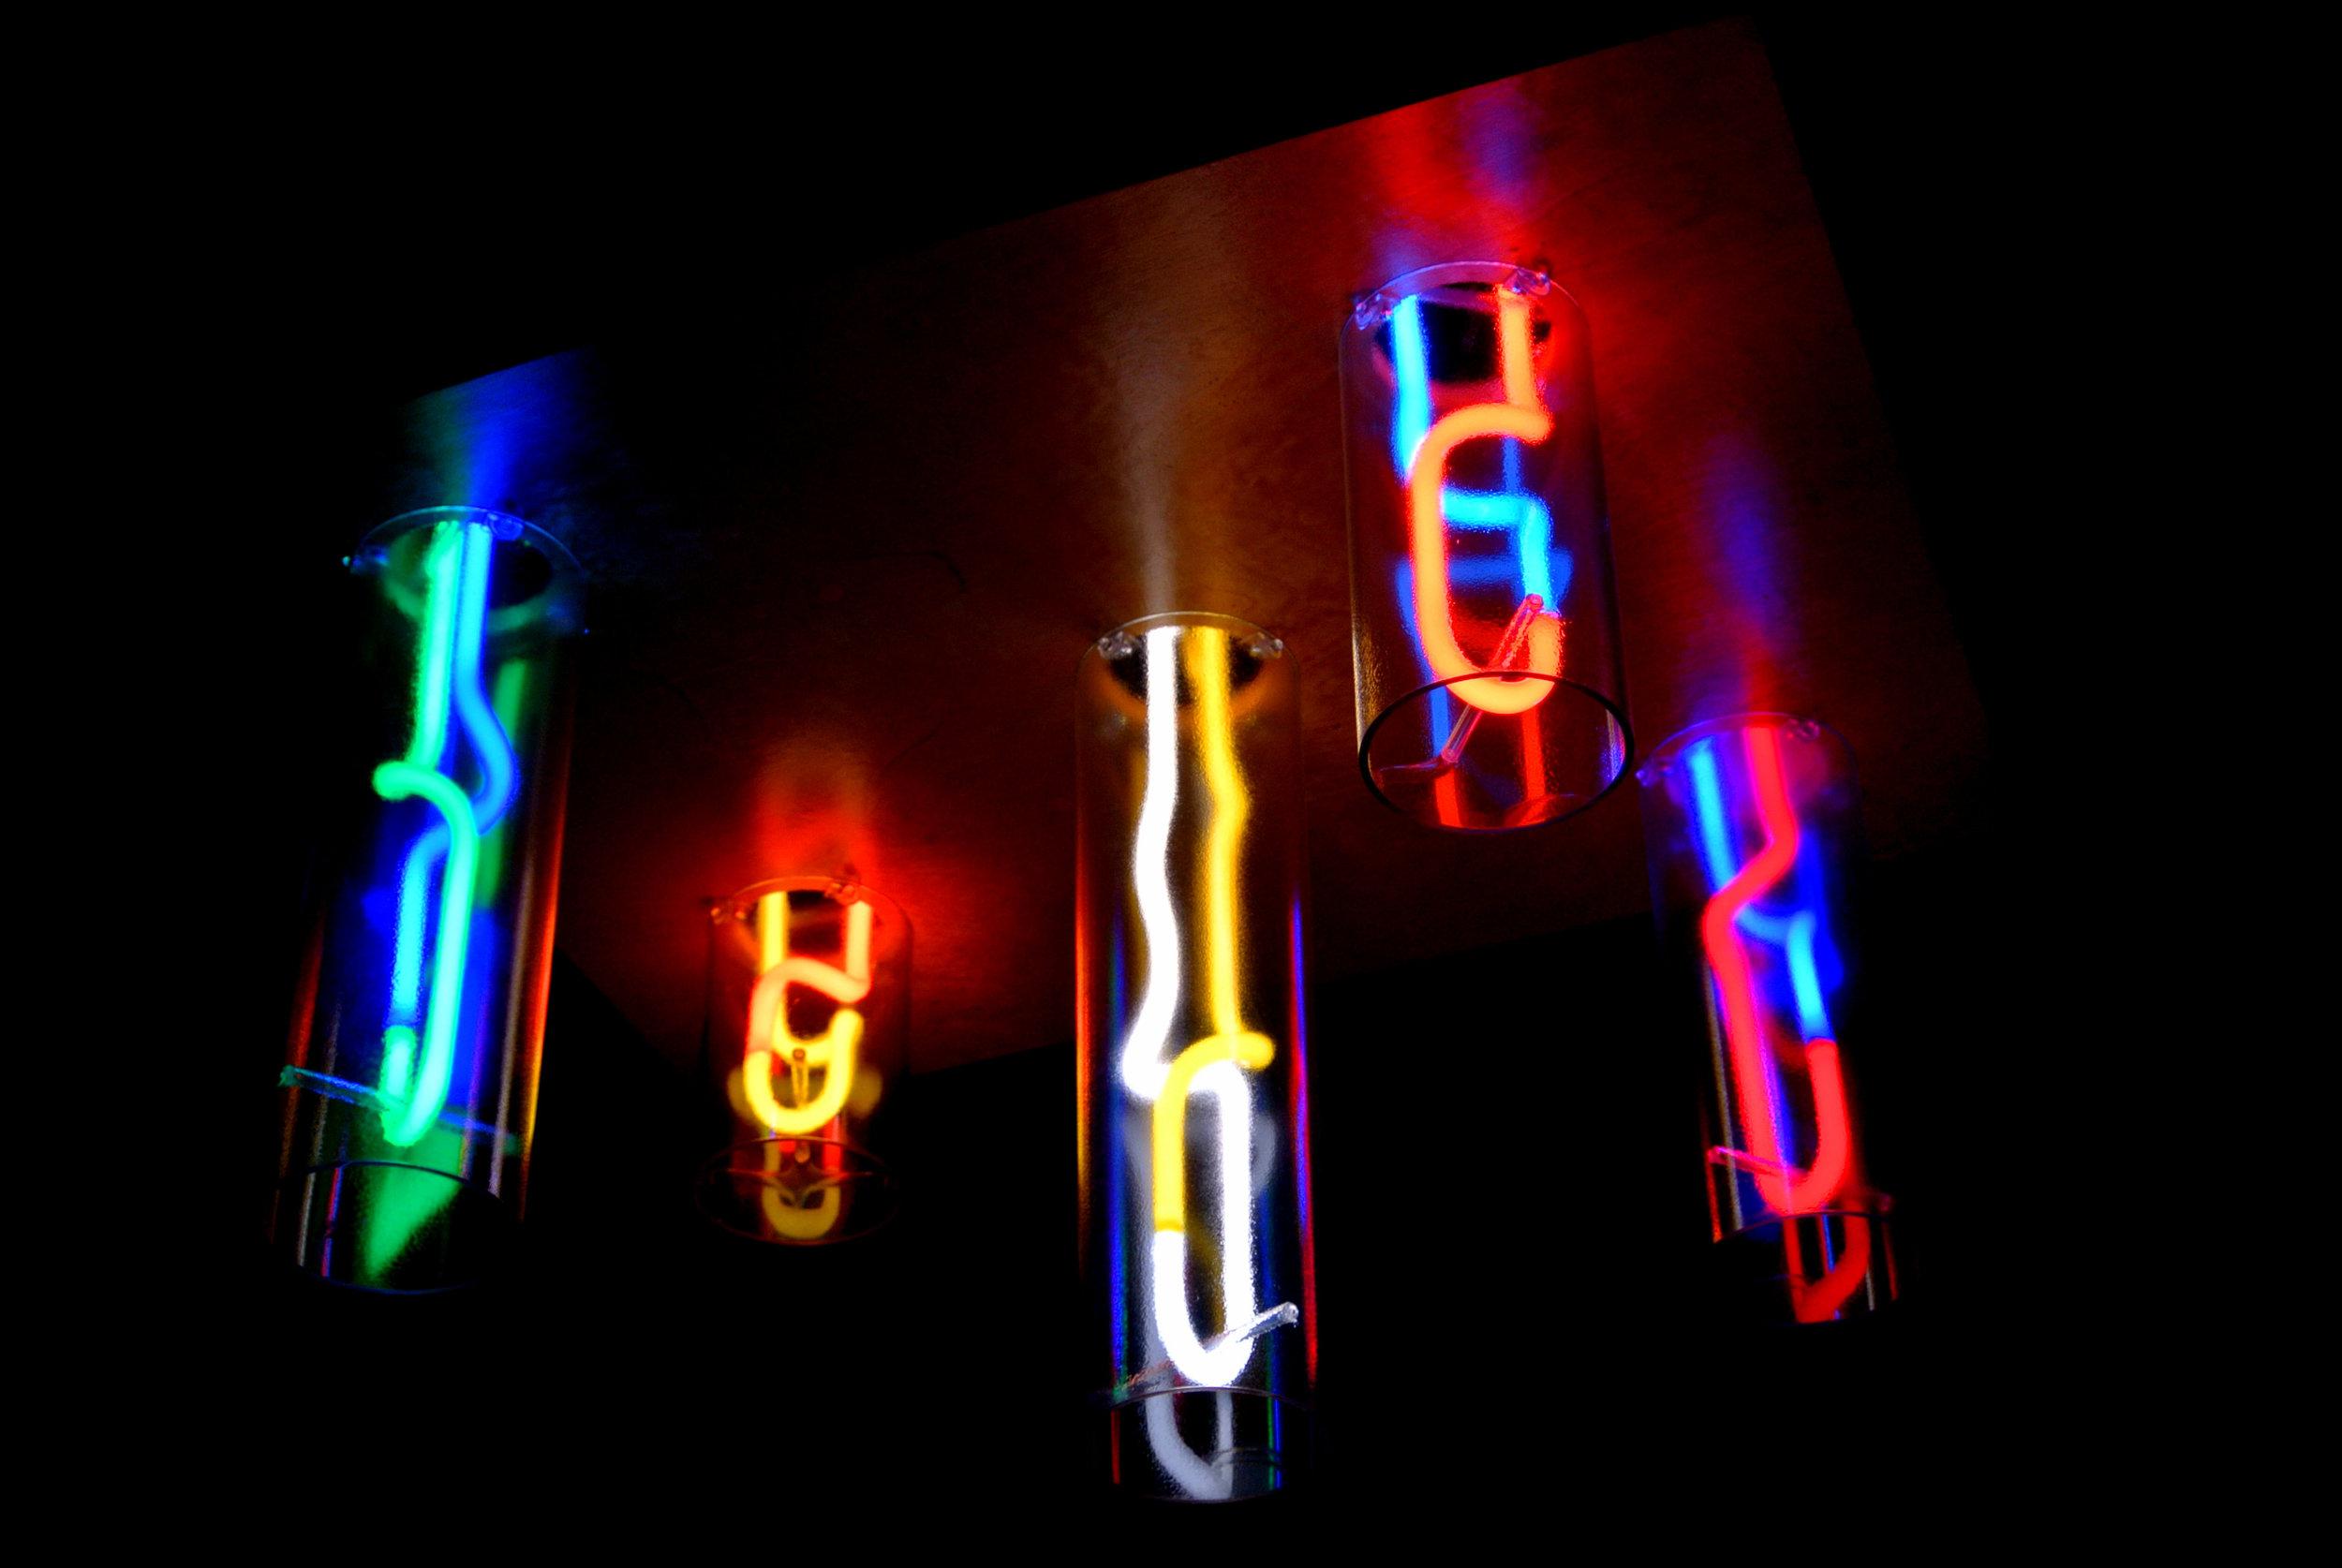 Custom Designer Neon Light Fixtures by John Barton - Famous USA Neon Glass Artist - BartonNeonMagic.com